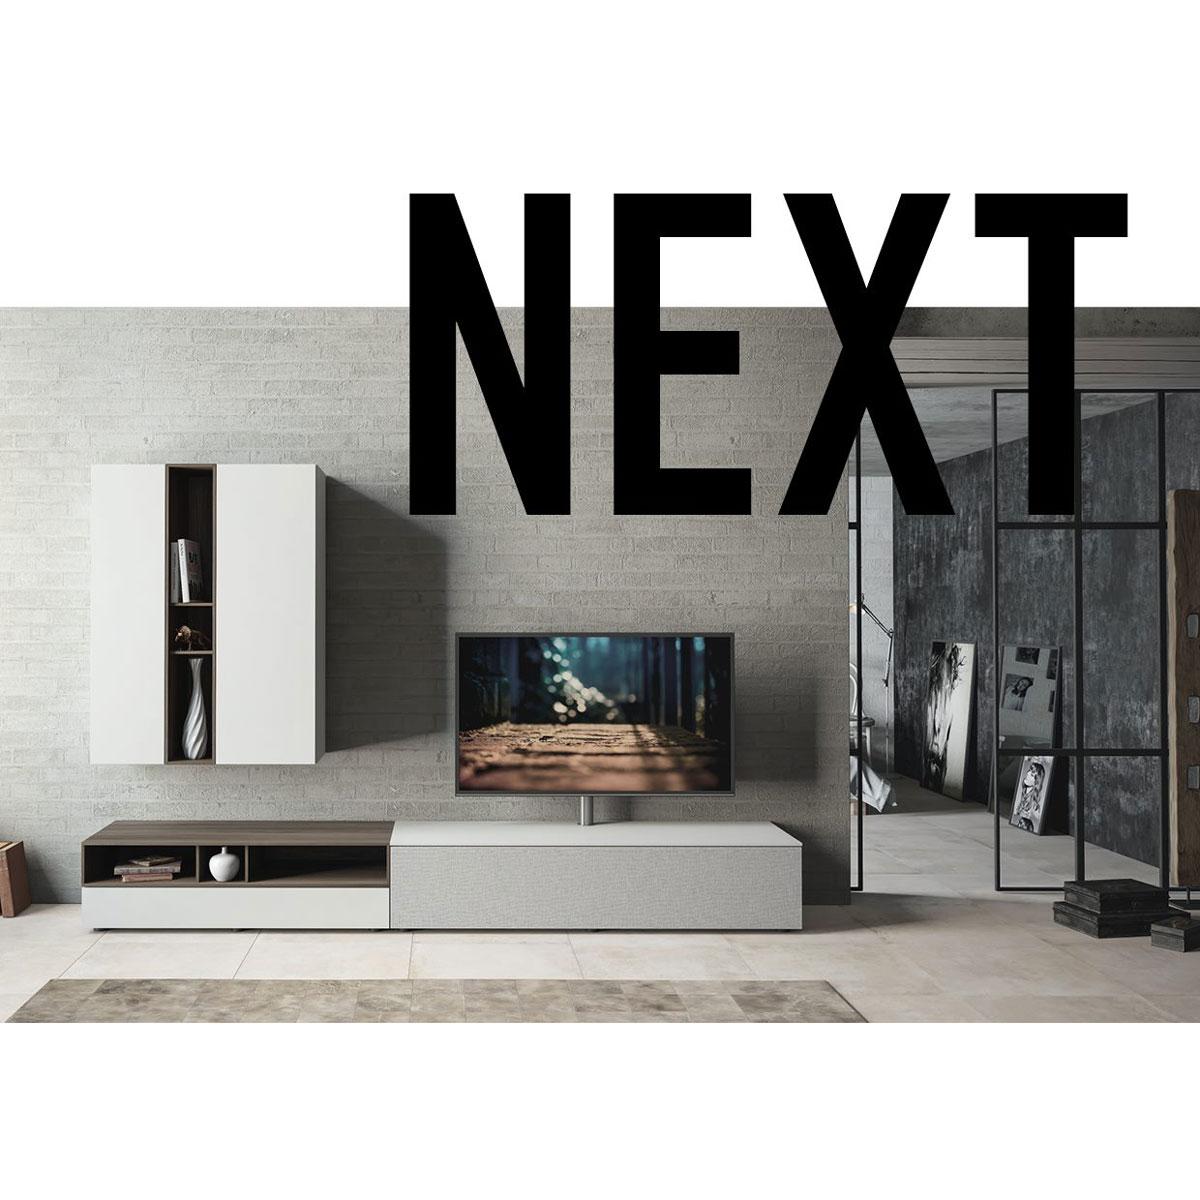 Lowboard hifi möbel  TV-Möbel, Fernsehmöbel, Möbel für LCD TV, Plasma Möbel bei hifi-tv ...